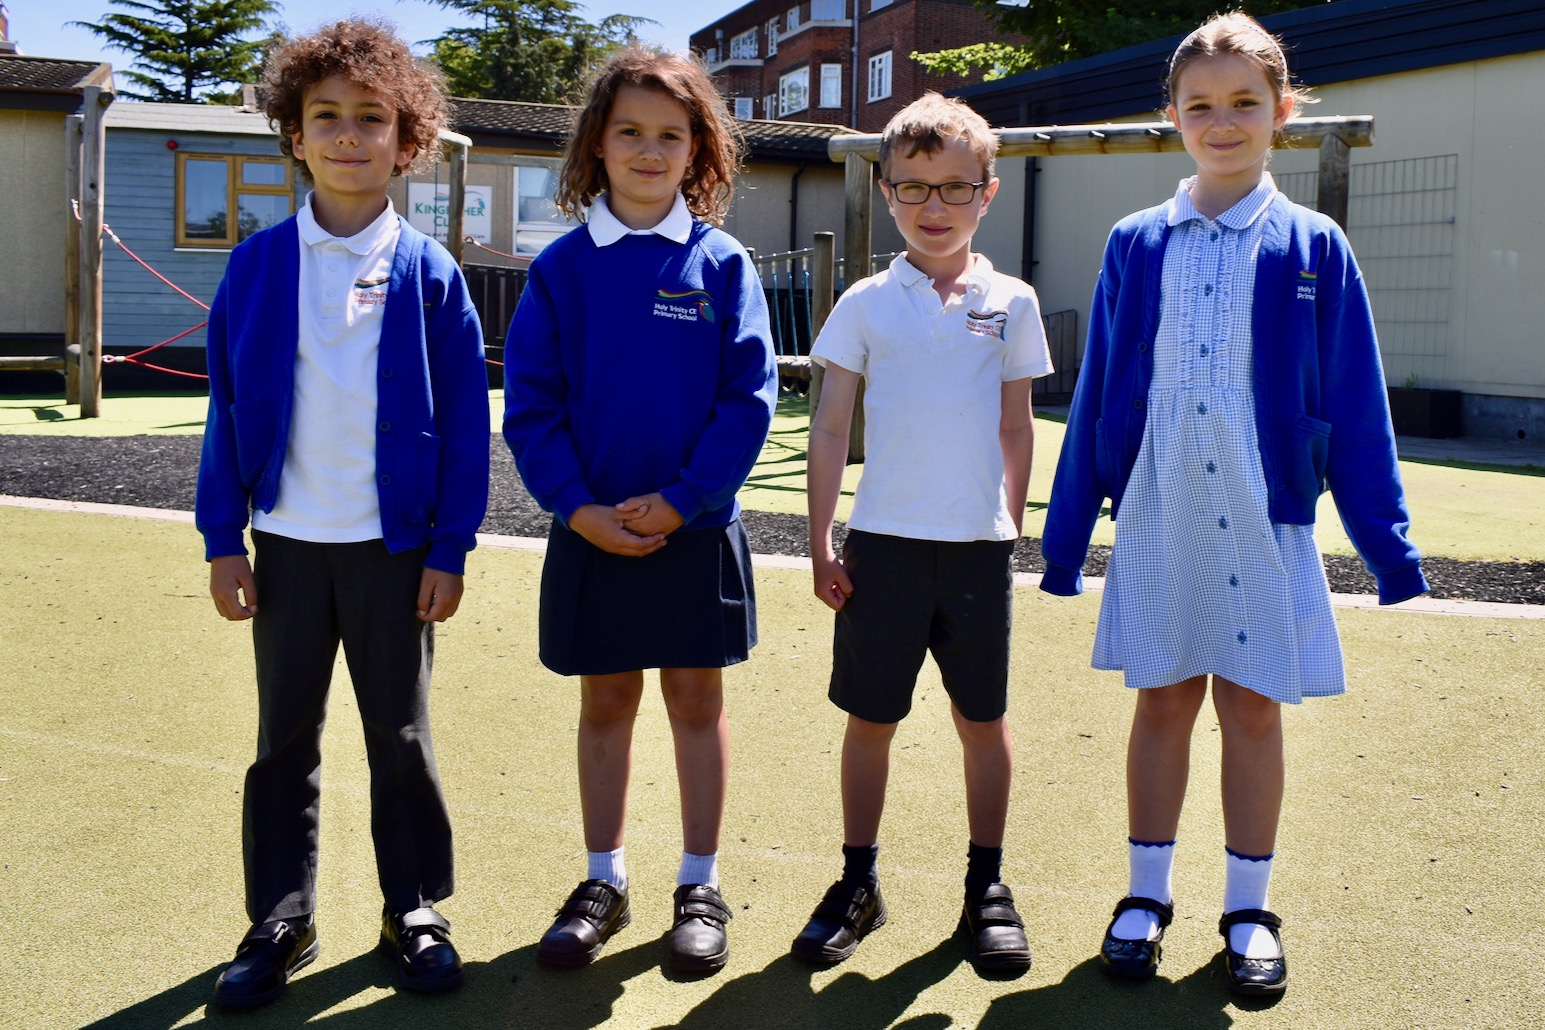 Holy Trinity School Uniform